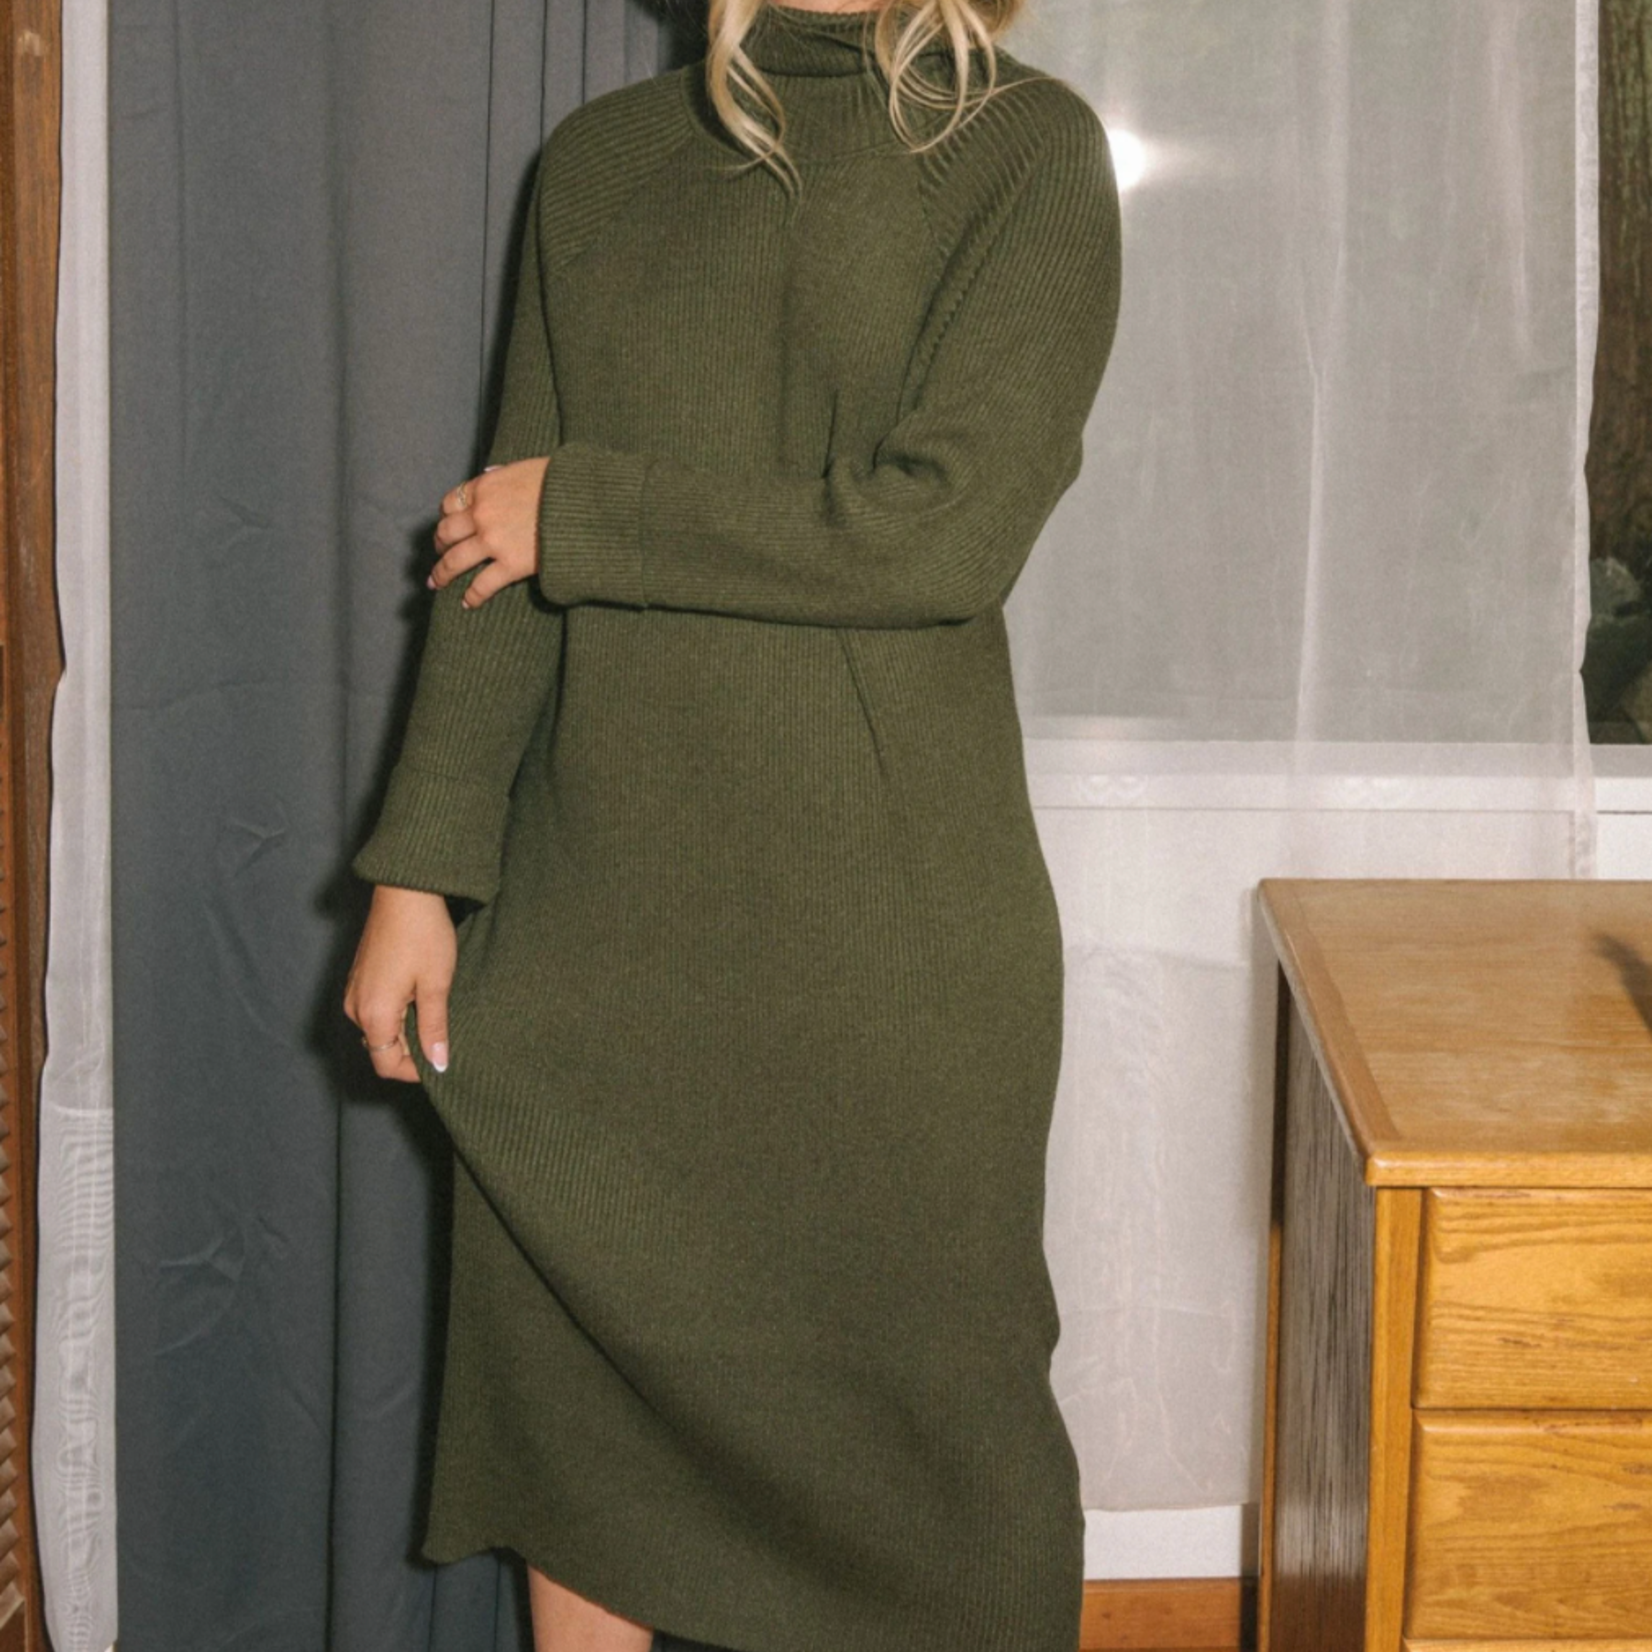 jackson rowe Priscilla Sweater Dress